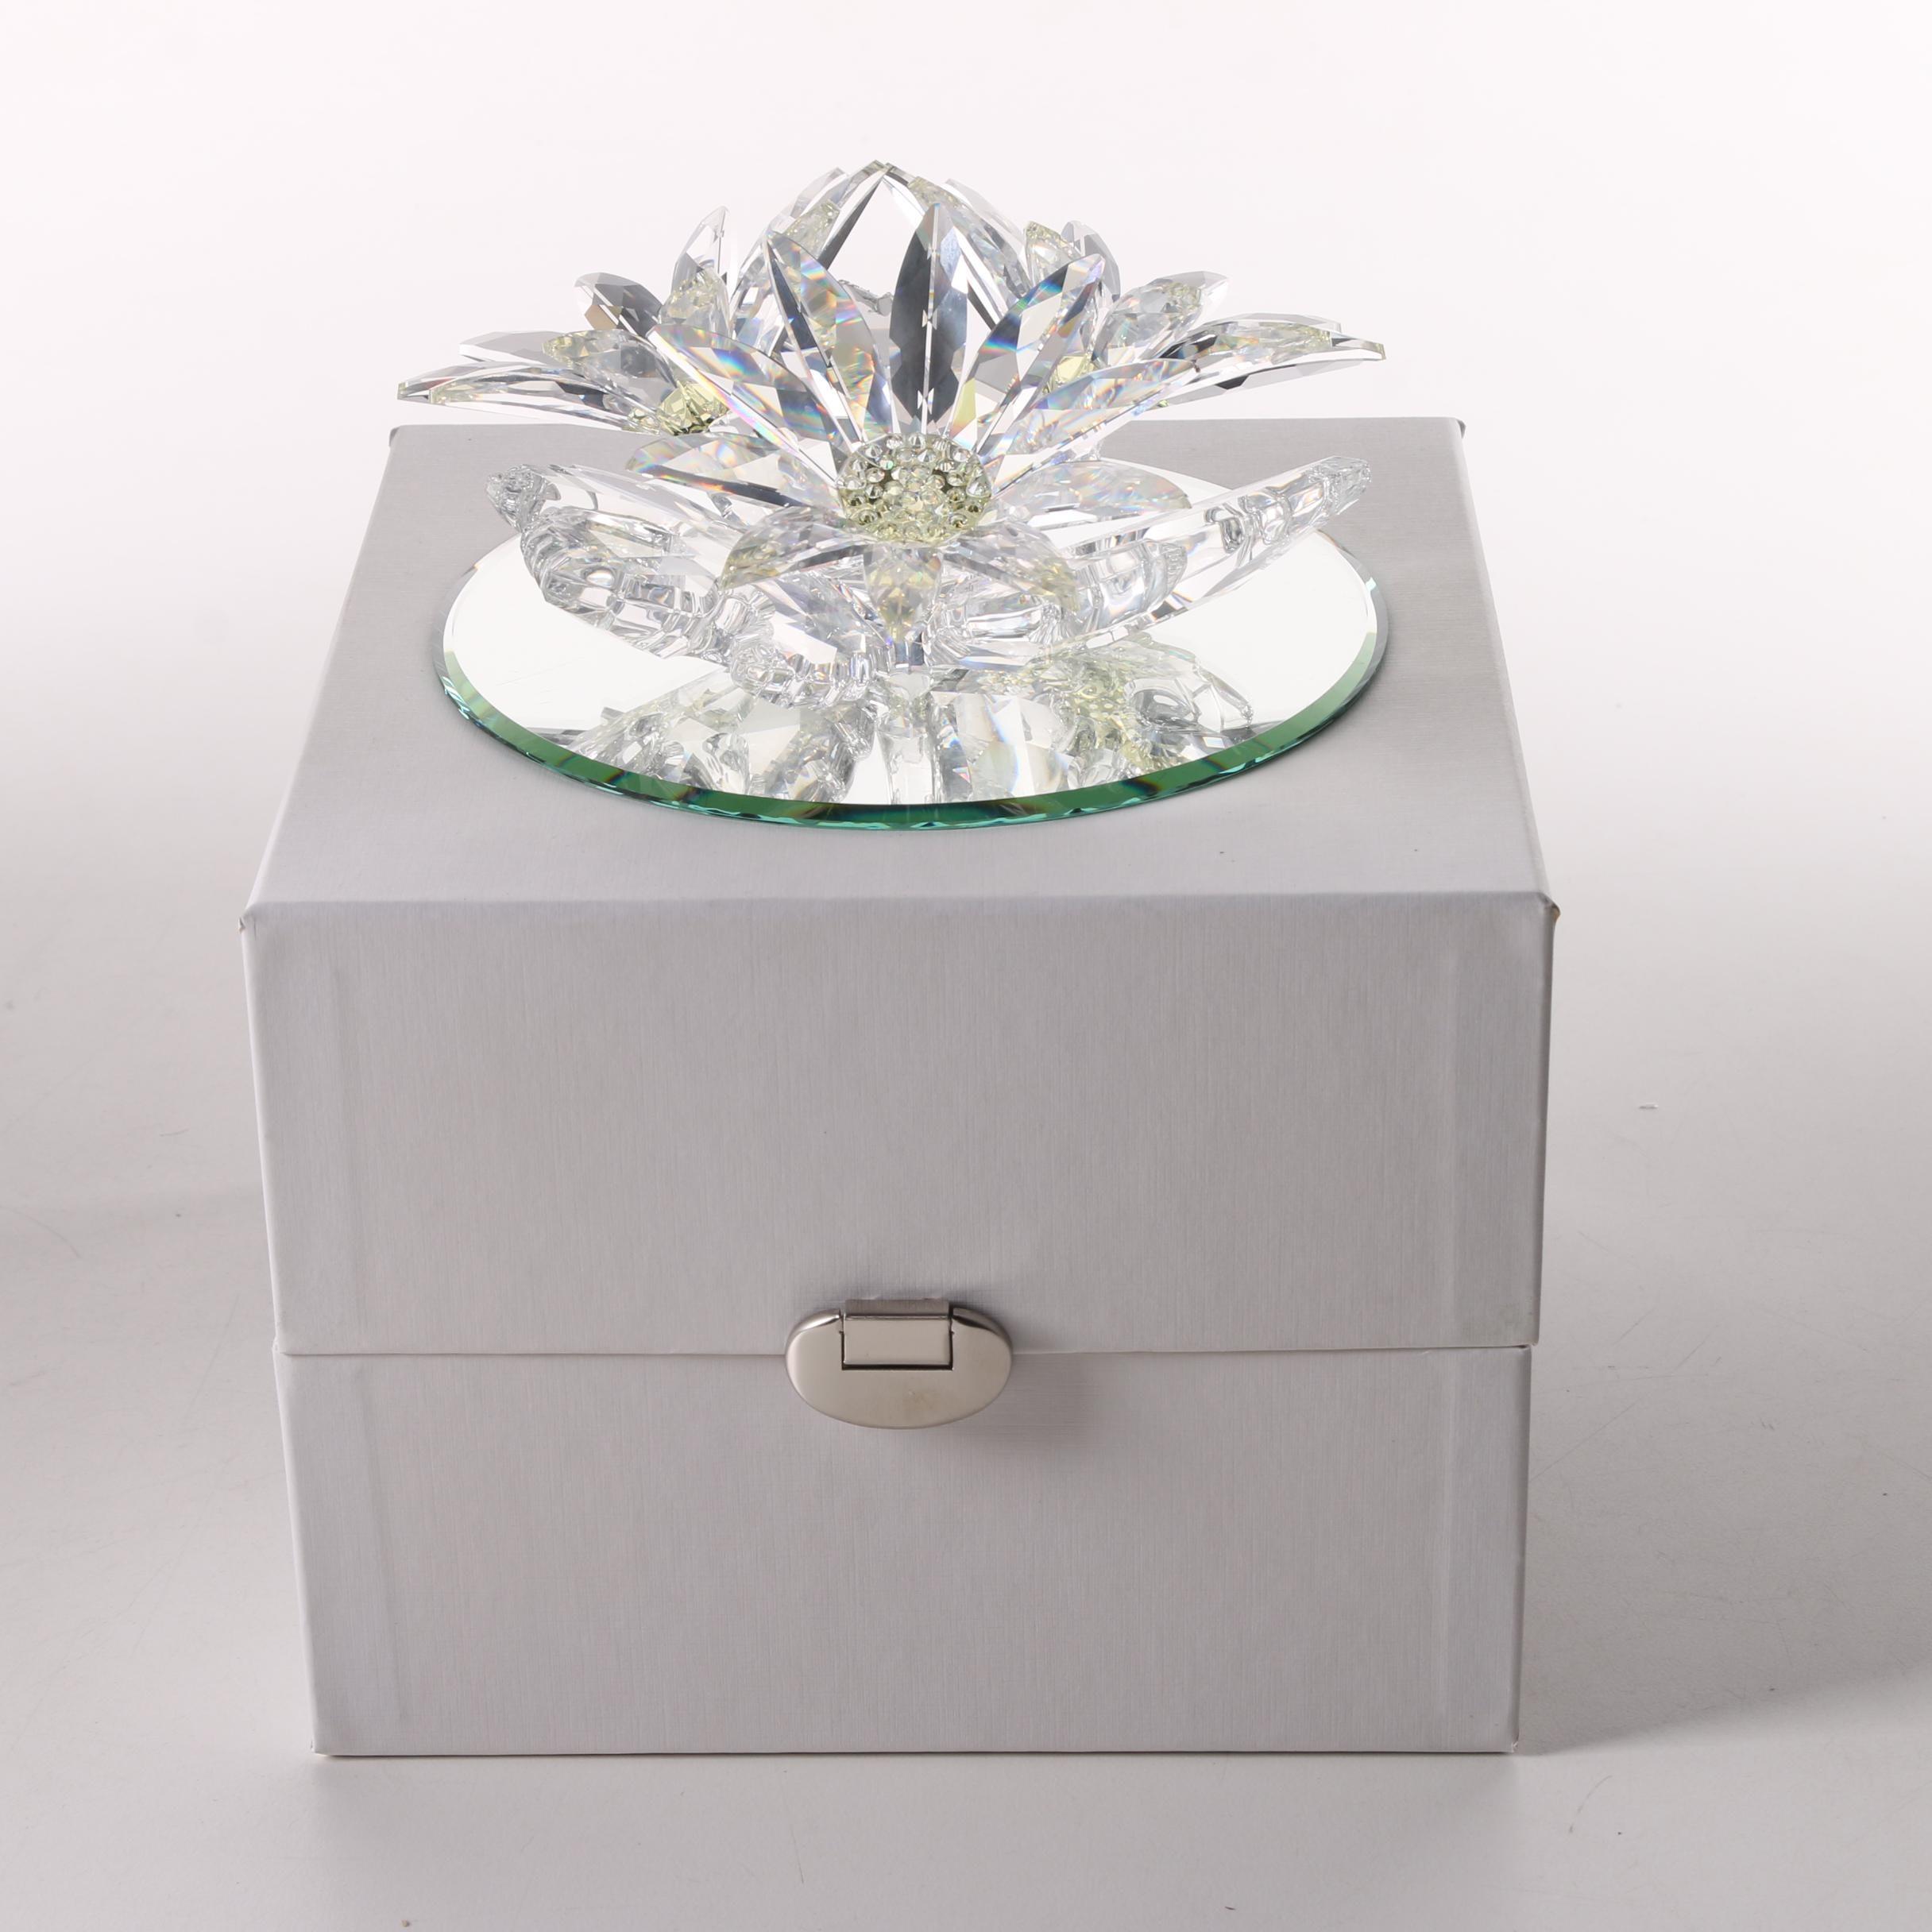 Swarovski Crystal Maxi Flower Arrangement